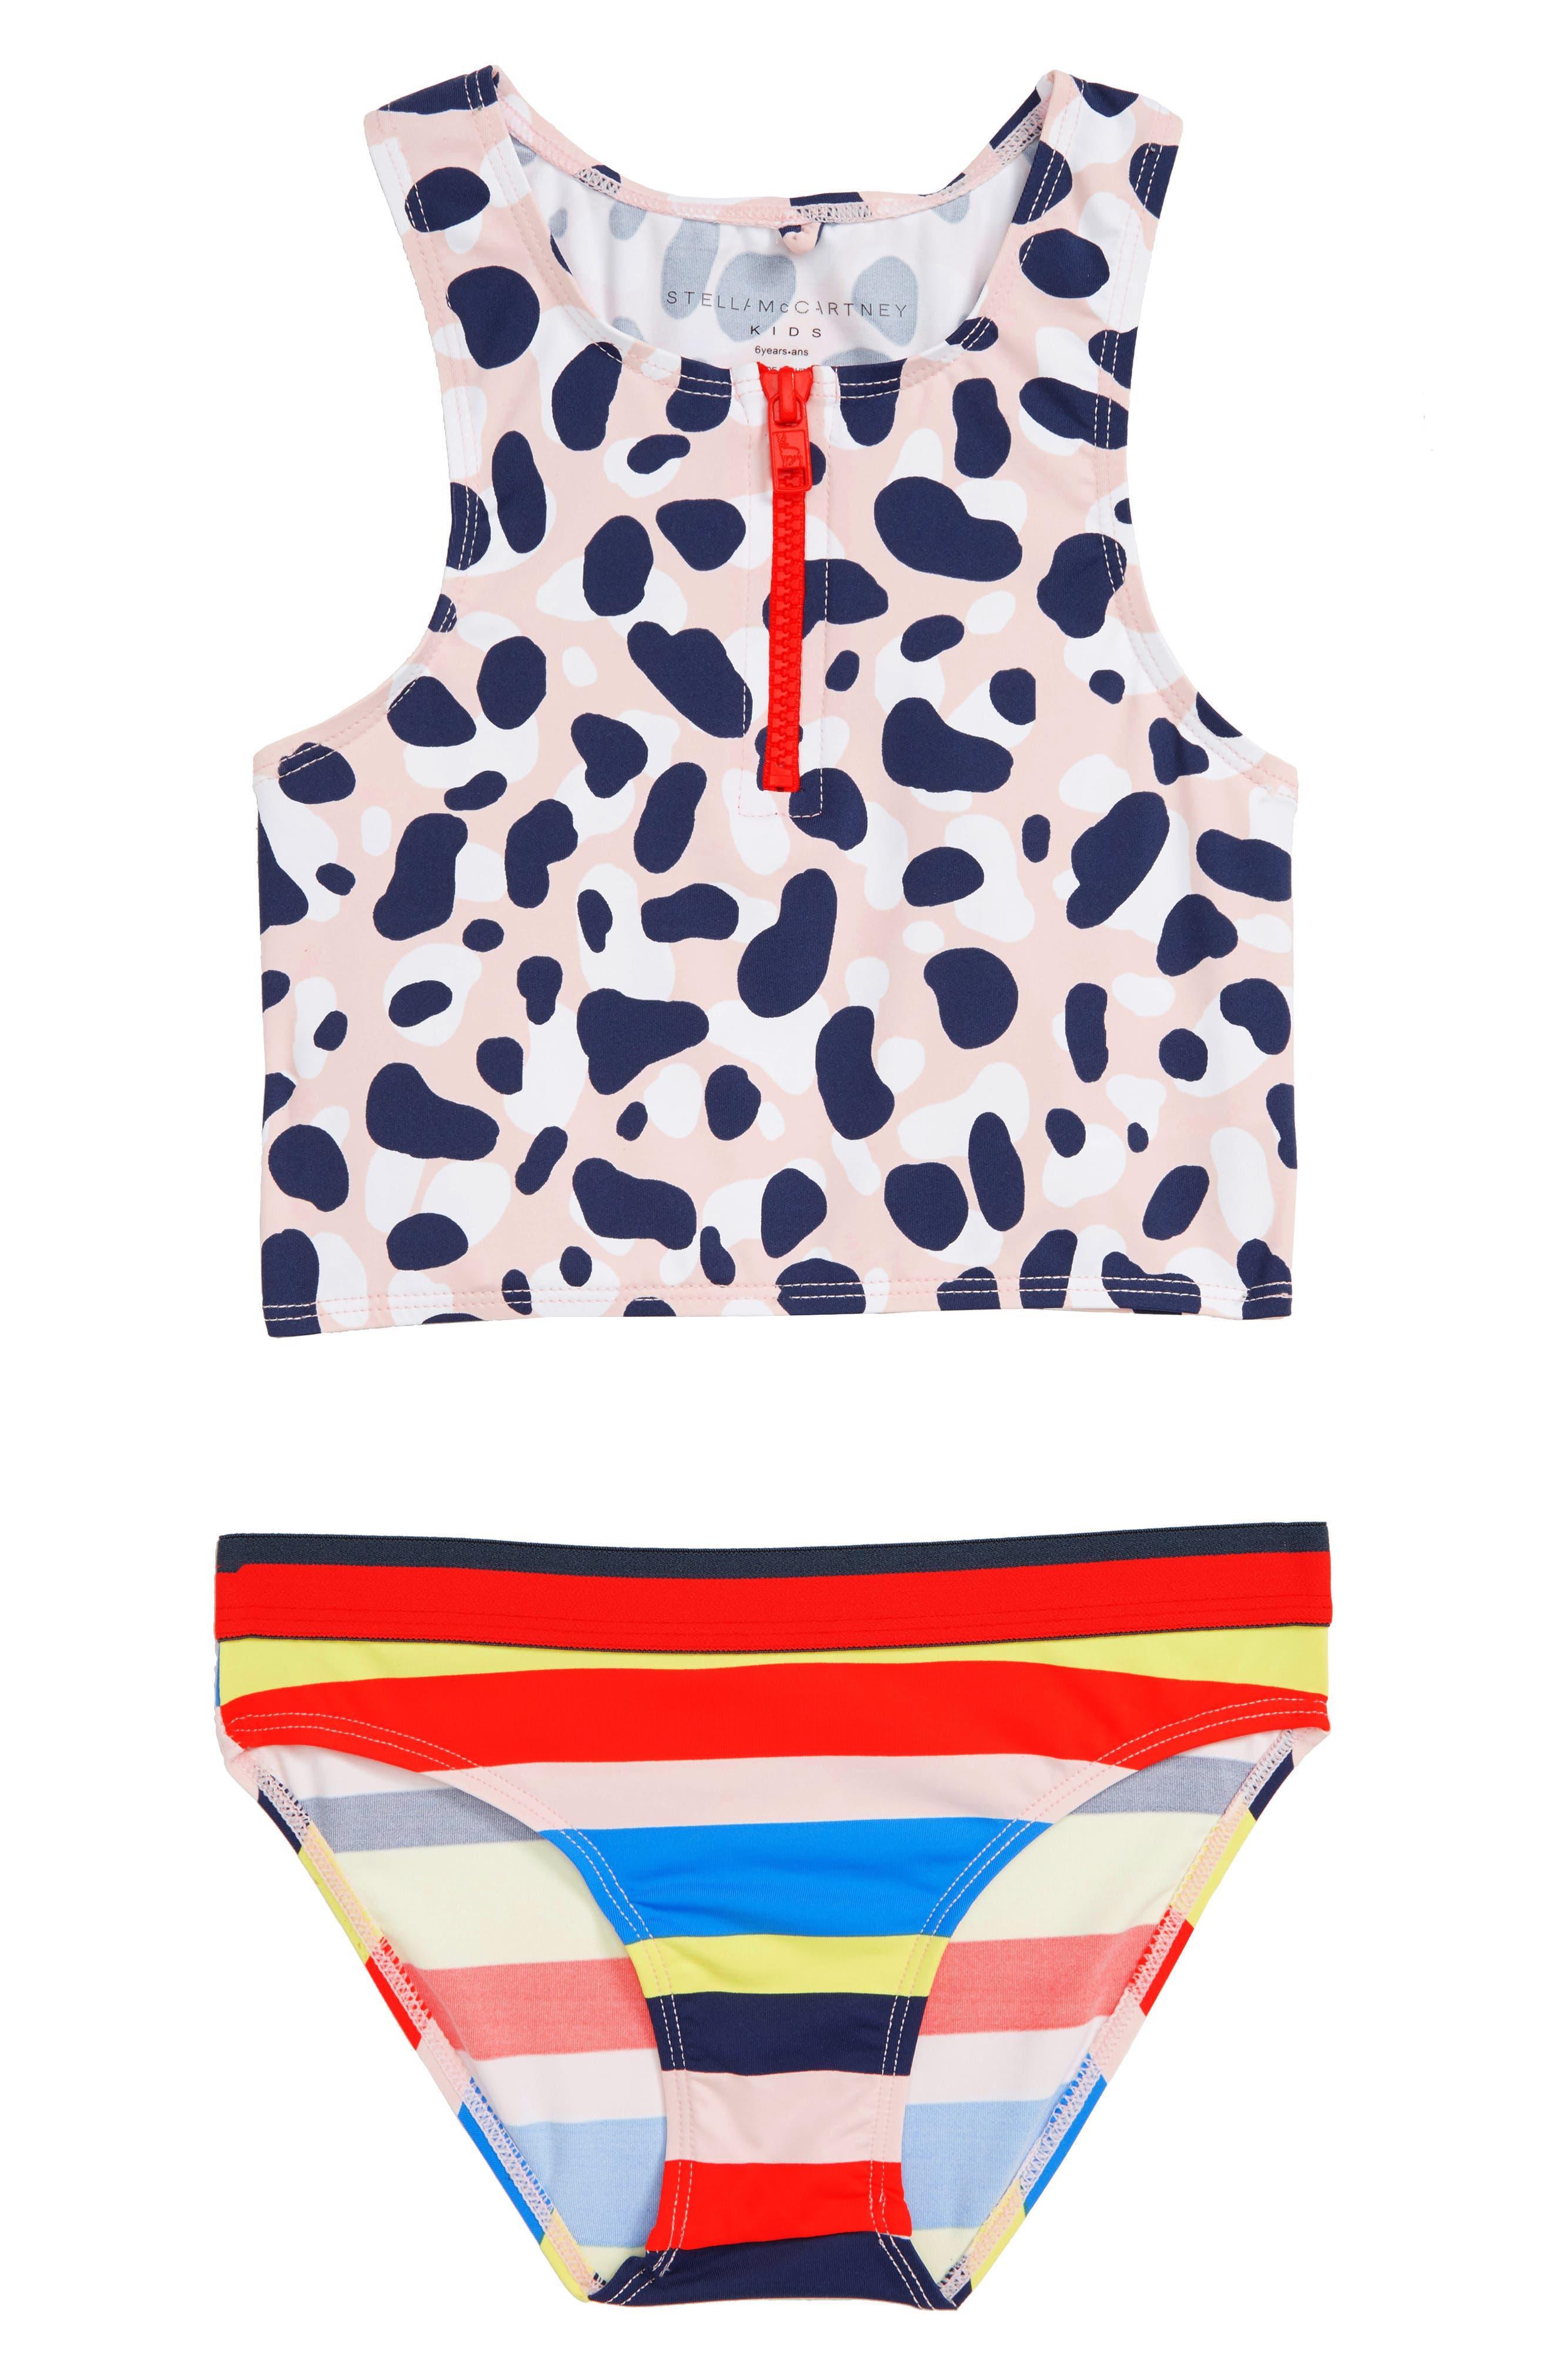 Stella McCartney Camo Print Two-Piece Swimsuit,                             Main thumbnail 1, color,                             MULTI